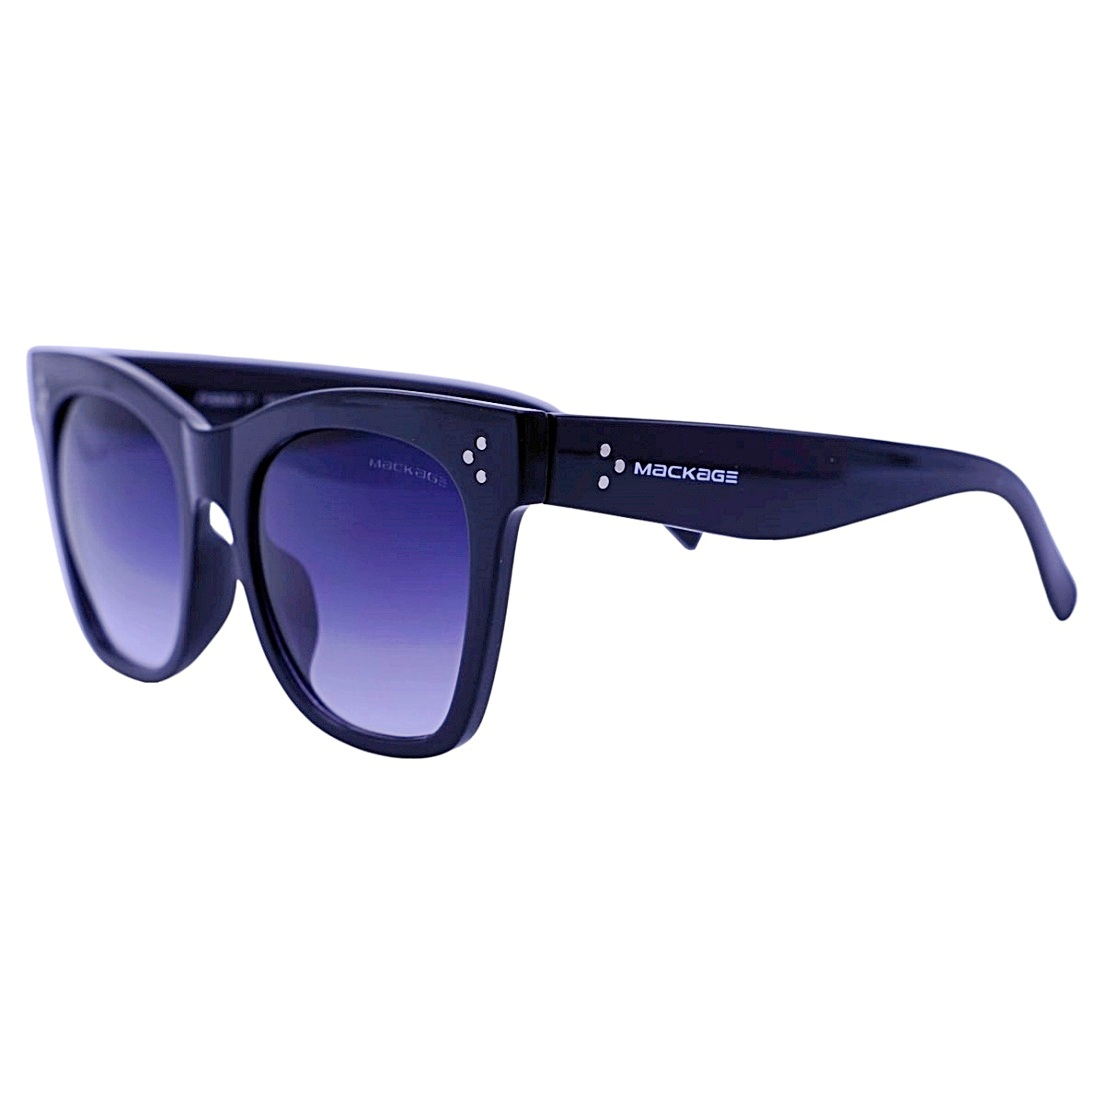 Óculos De Sol Mackage Feminino Acetato Oversize Quadrado Retro